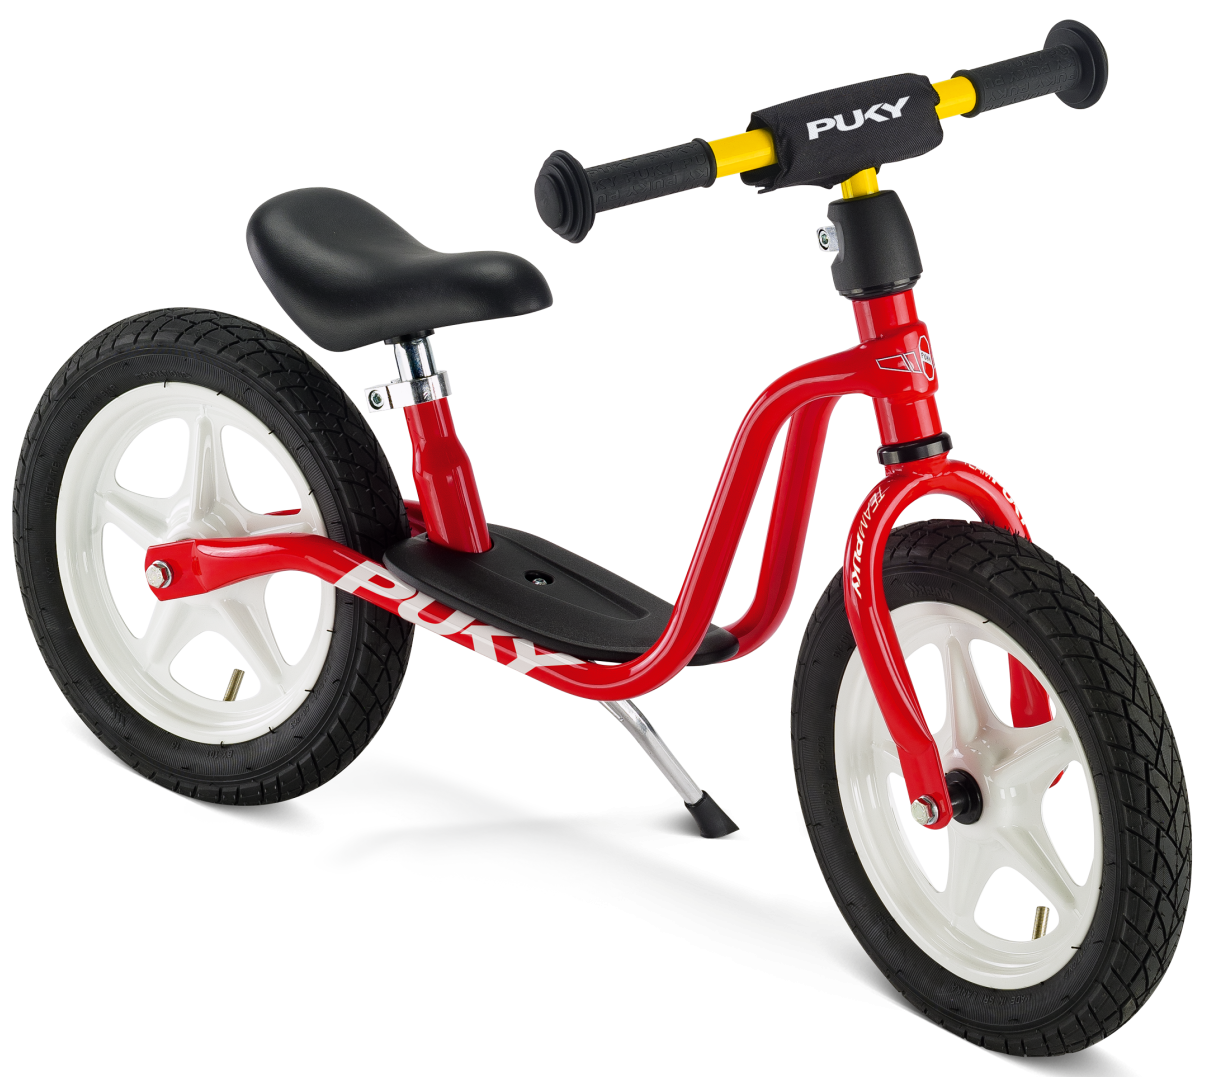 Puky LR 1 L Løbecykel - Rød